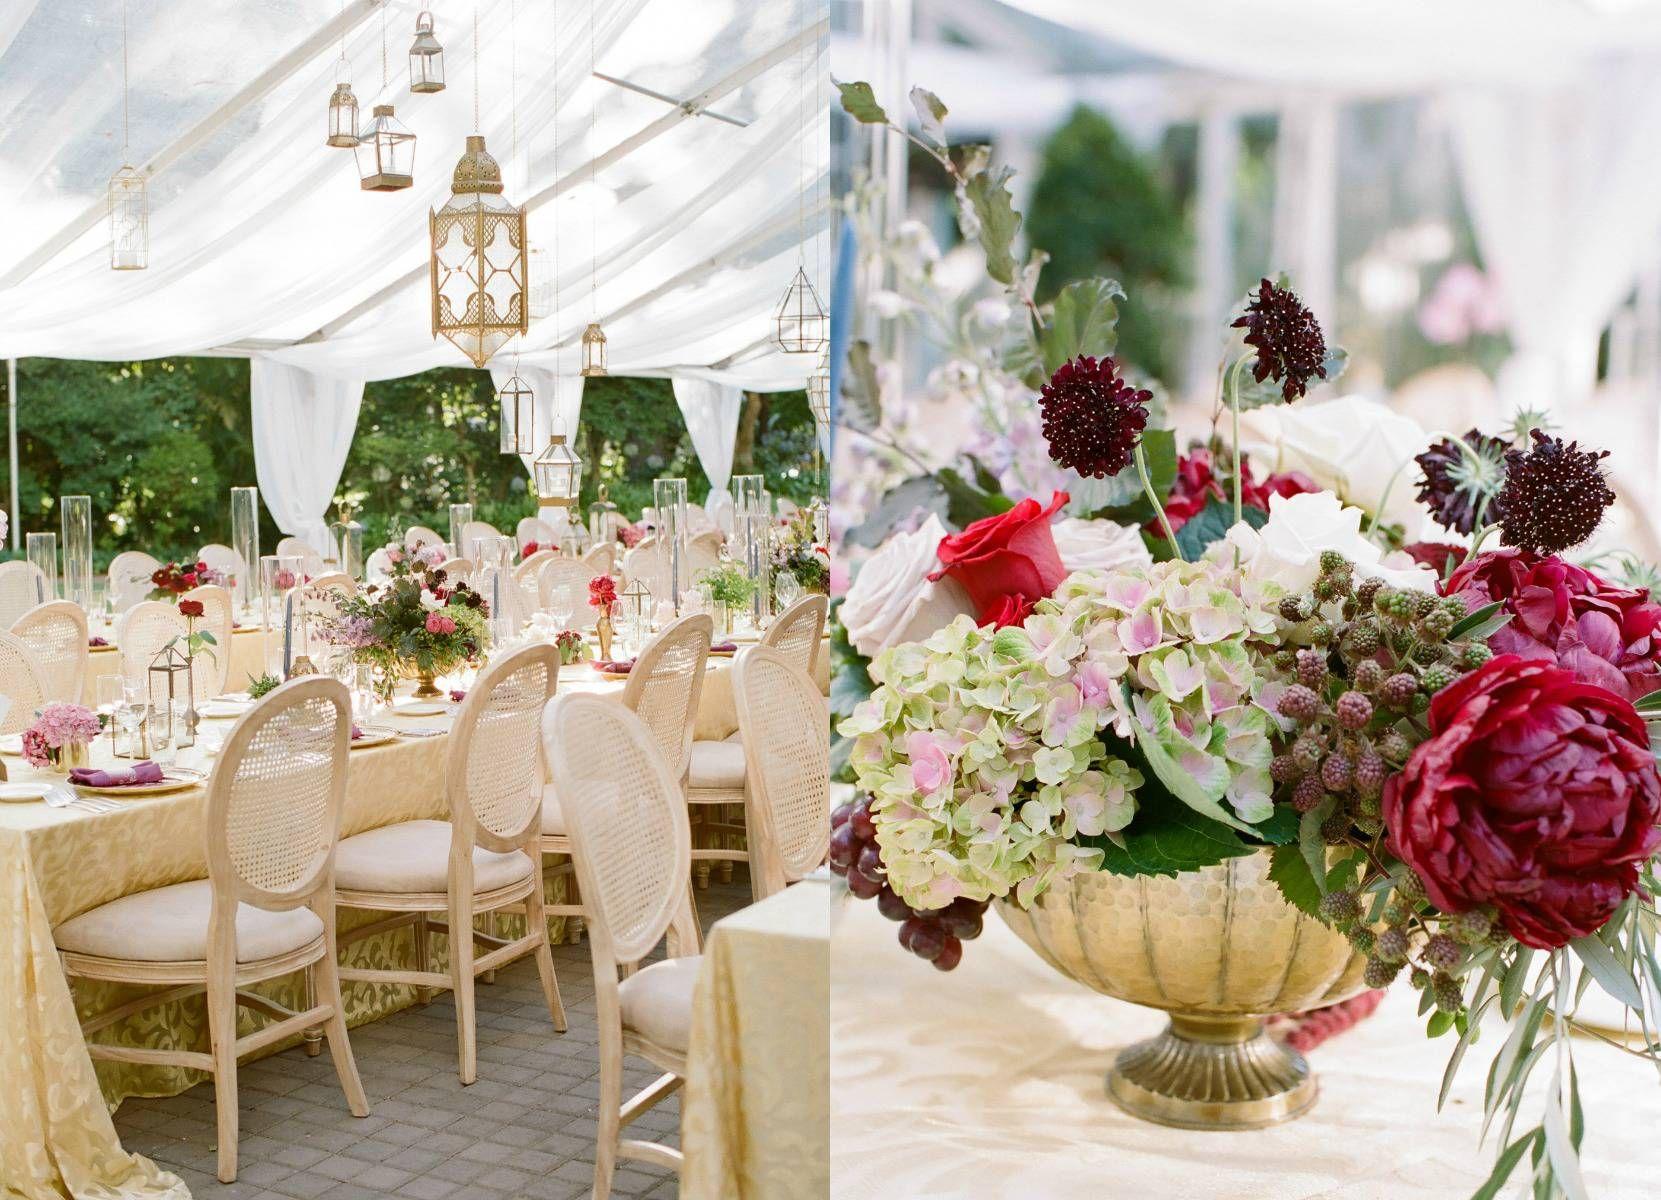 Wedded Wonderland Wedding, Our wedding, Table decorations